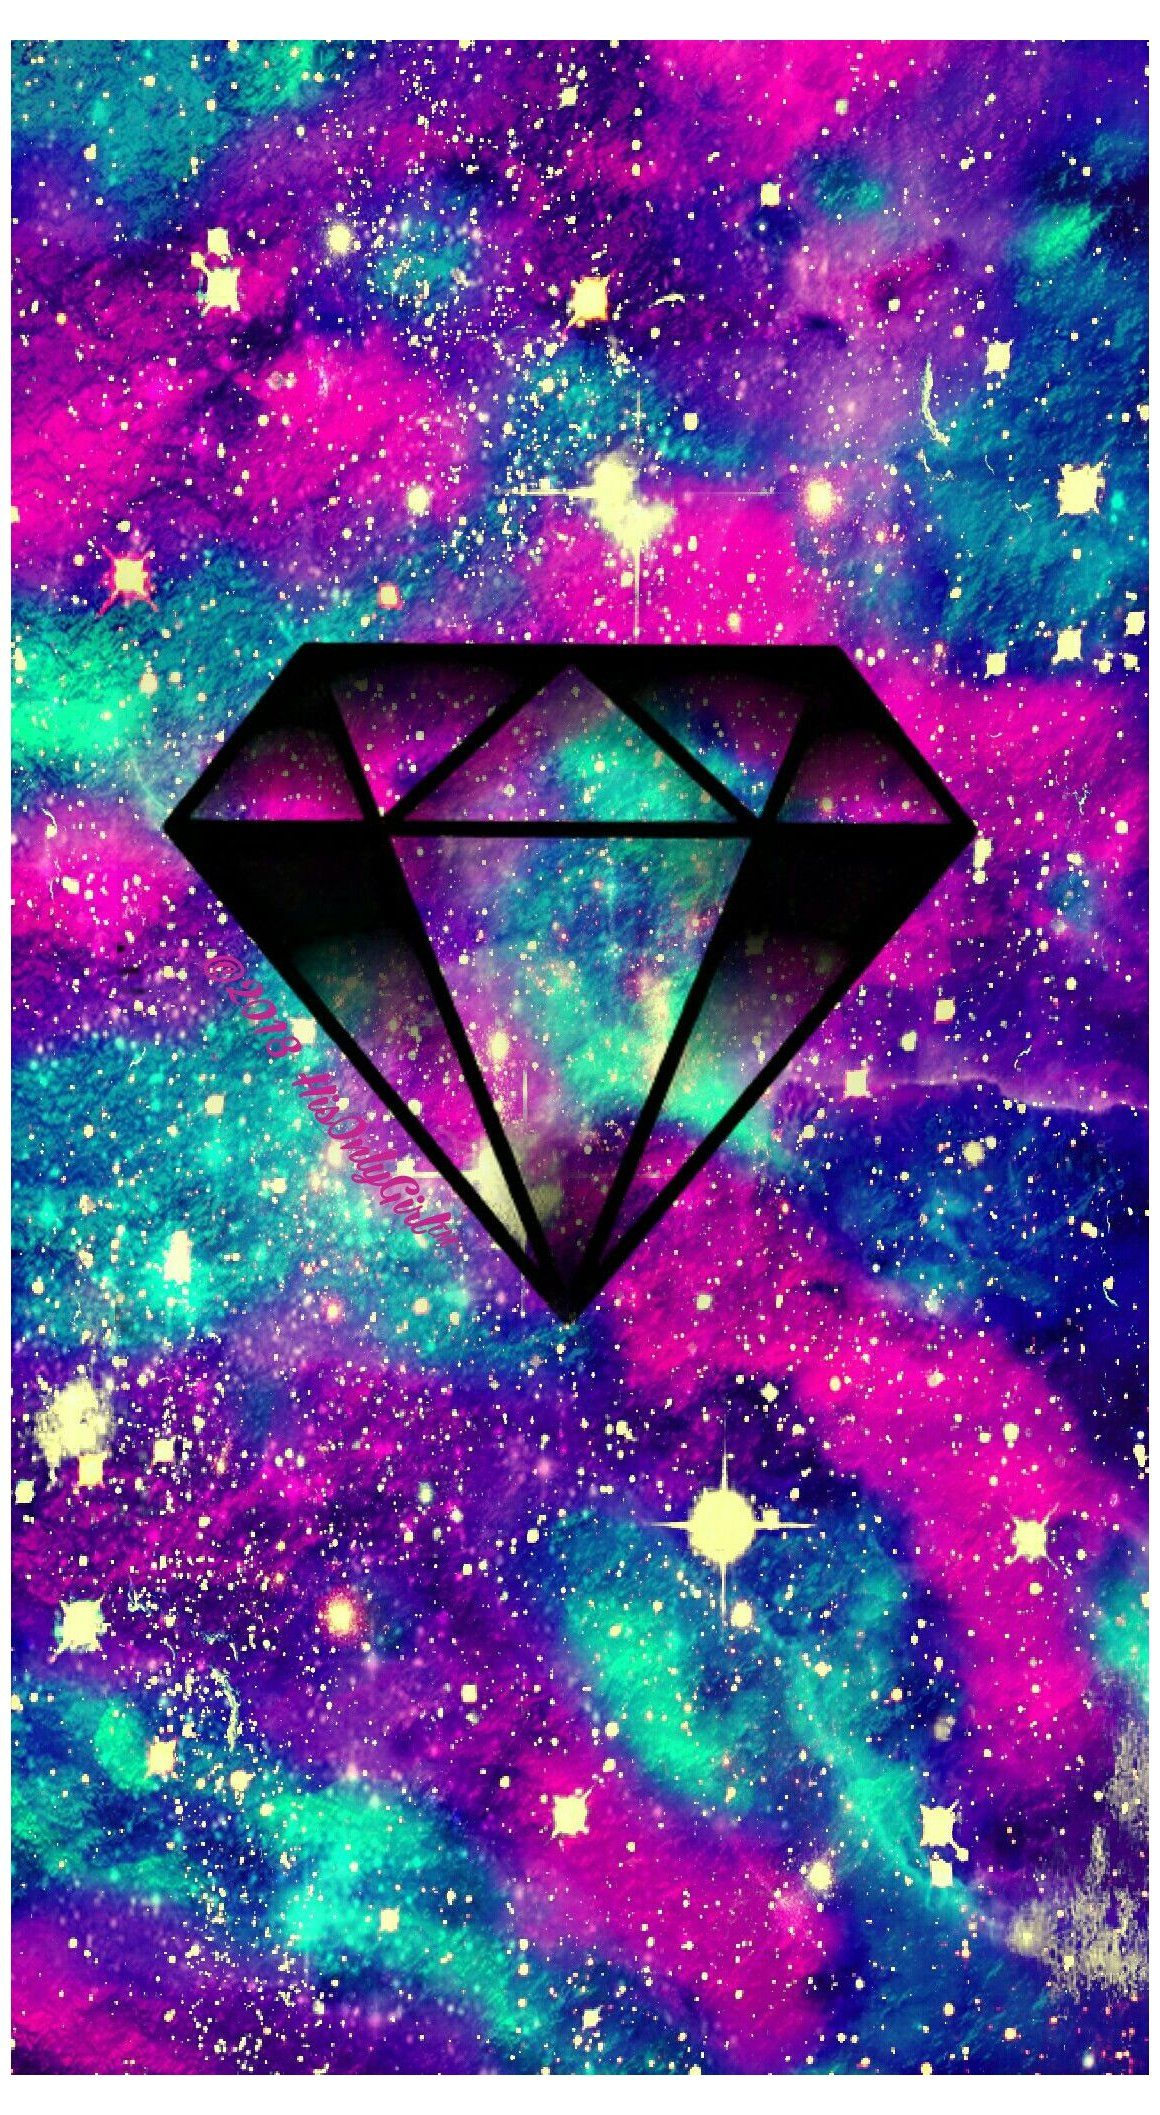 Diamond Wallpaper Iphone Galaxy Diamondwallpaperiphonegalaxy Diamond Lovely Galaxy Android Ip Unicorn Wallpaper Diamond Wallpaper Iphone Cute Wallpapers Galaxy purple diamond wallpaper